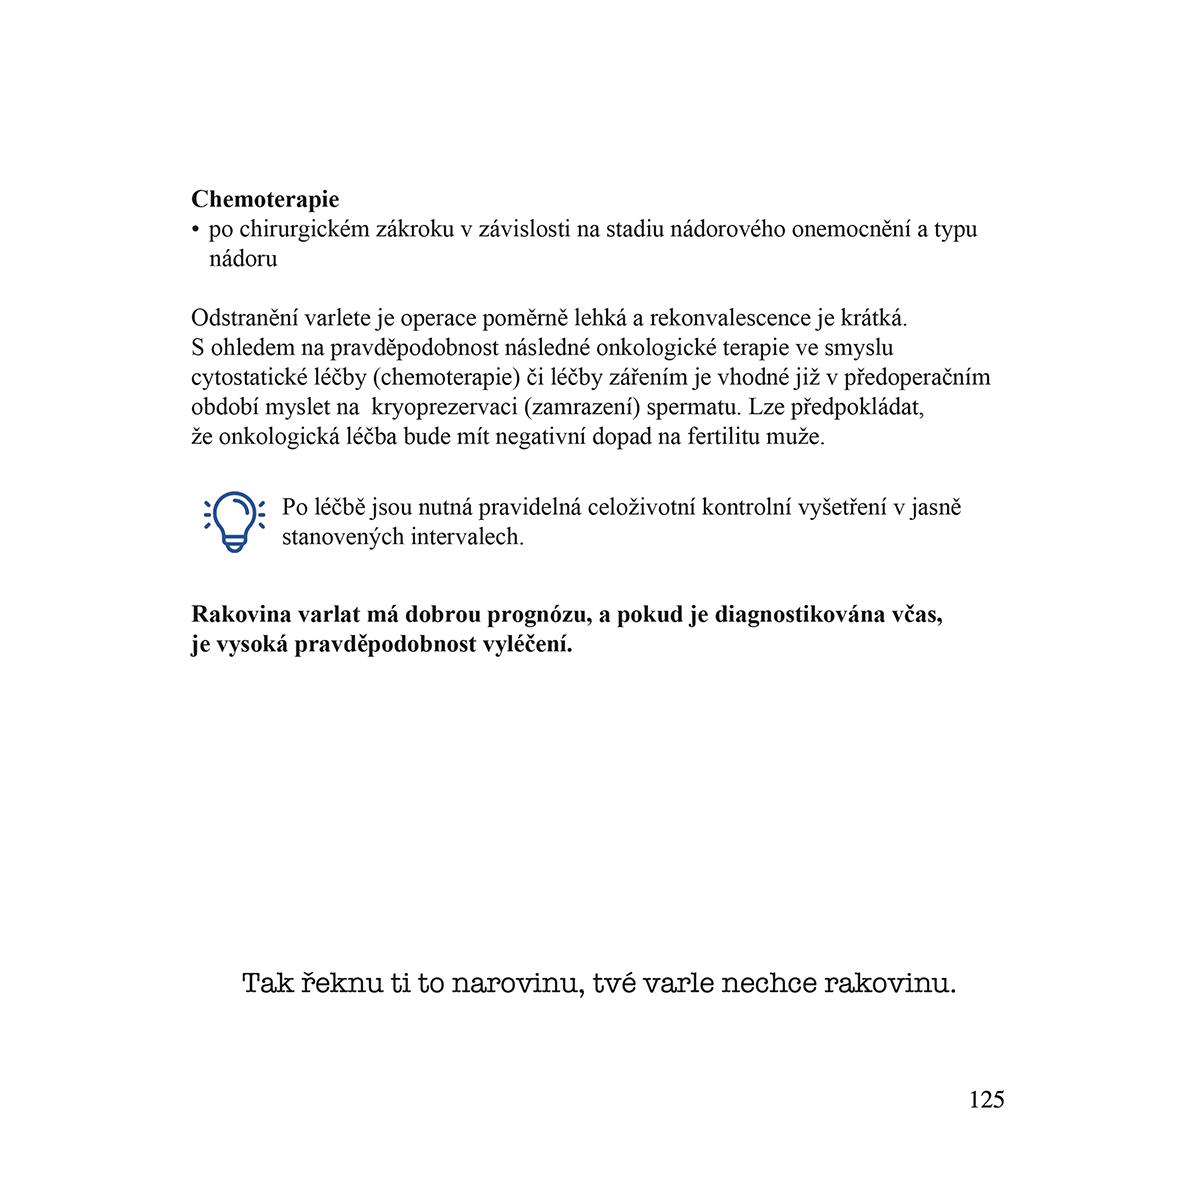 ukazka 25